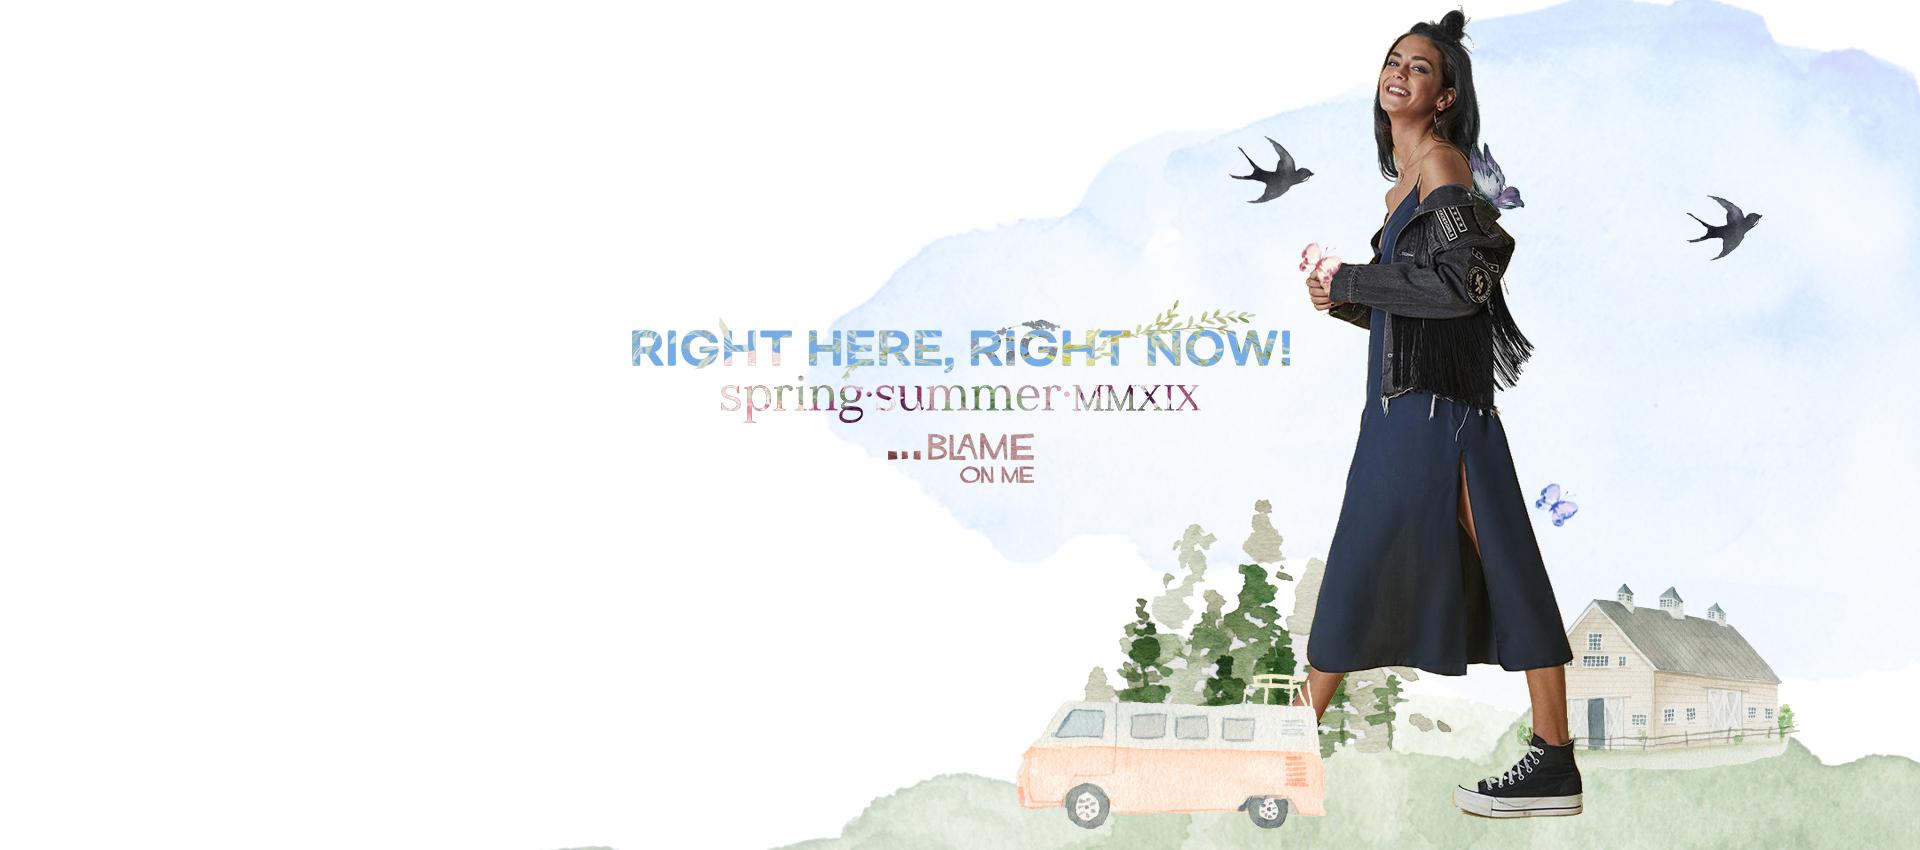 blame-spring-summer-2019-003